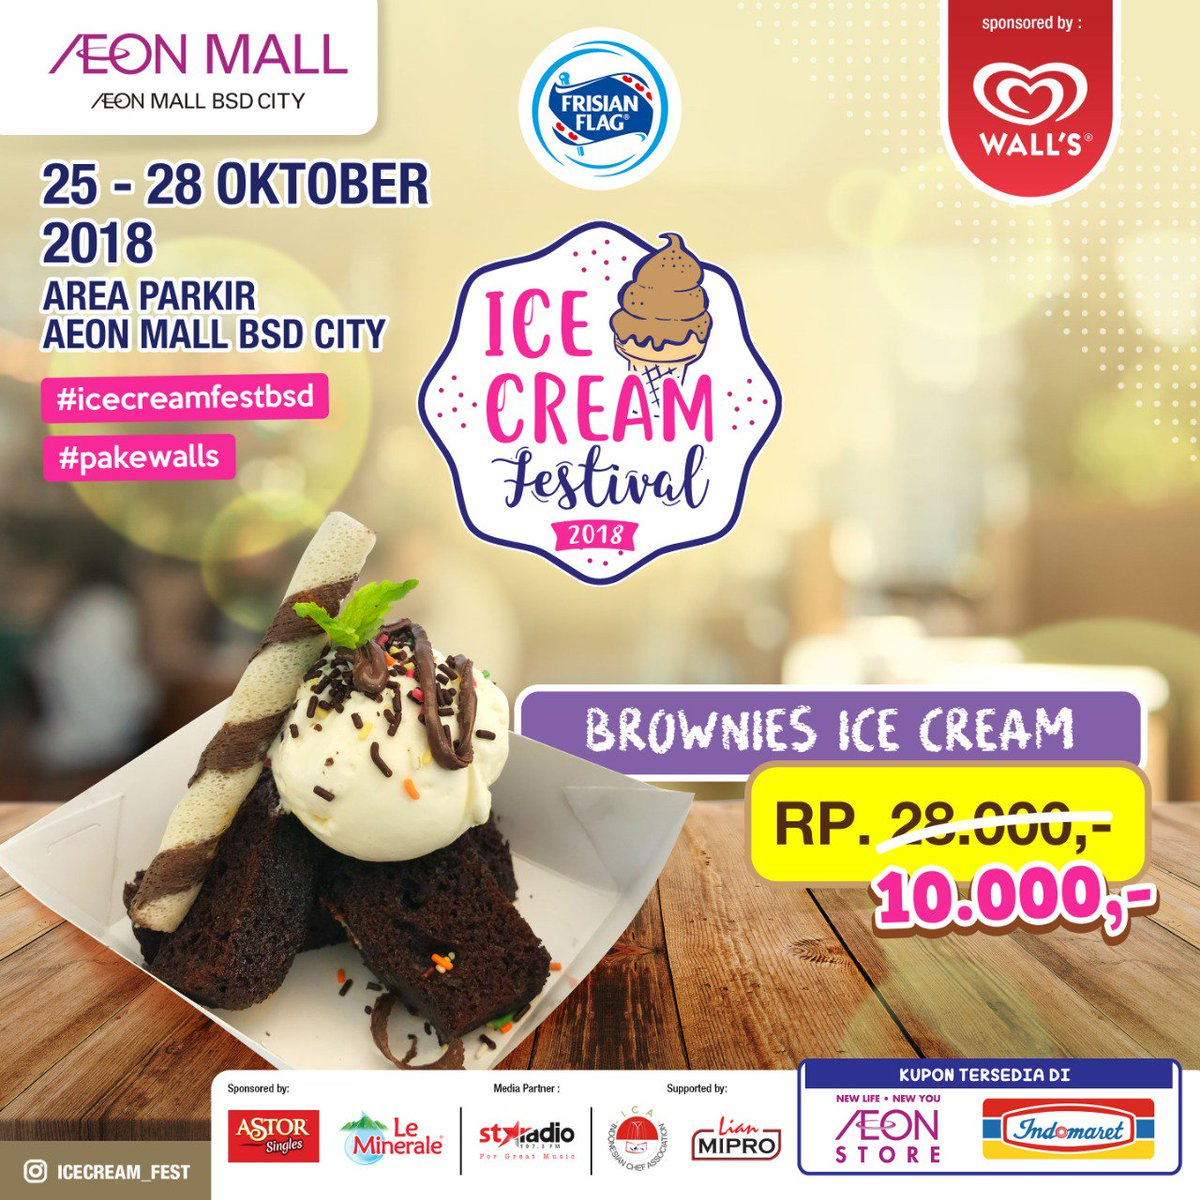 Cuma Rp 10.000,- lho Dimana lagi kalo bukan di Ice Cream Festival dari  tanggal 25-28 Oktober 2018 pukul 14.00pic.twitter.com/13orSbrFih